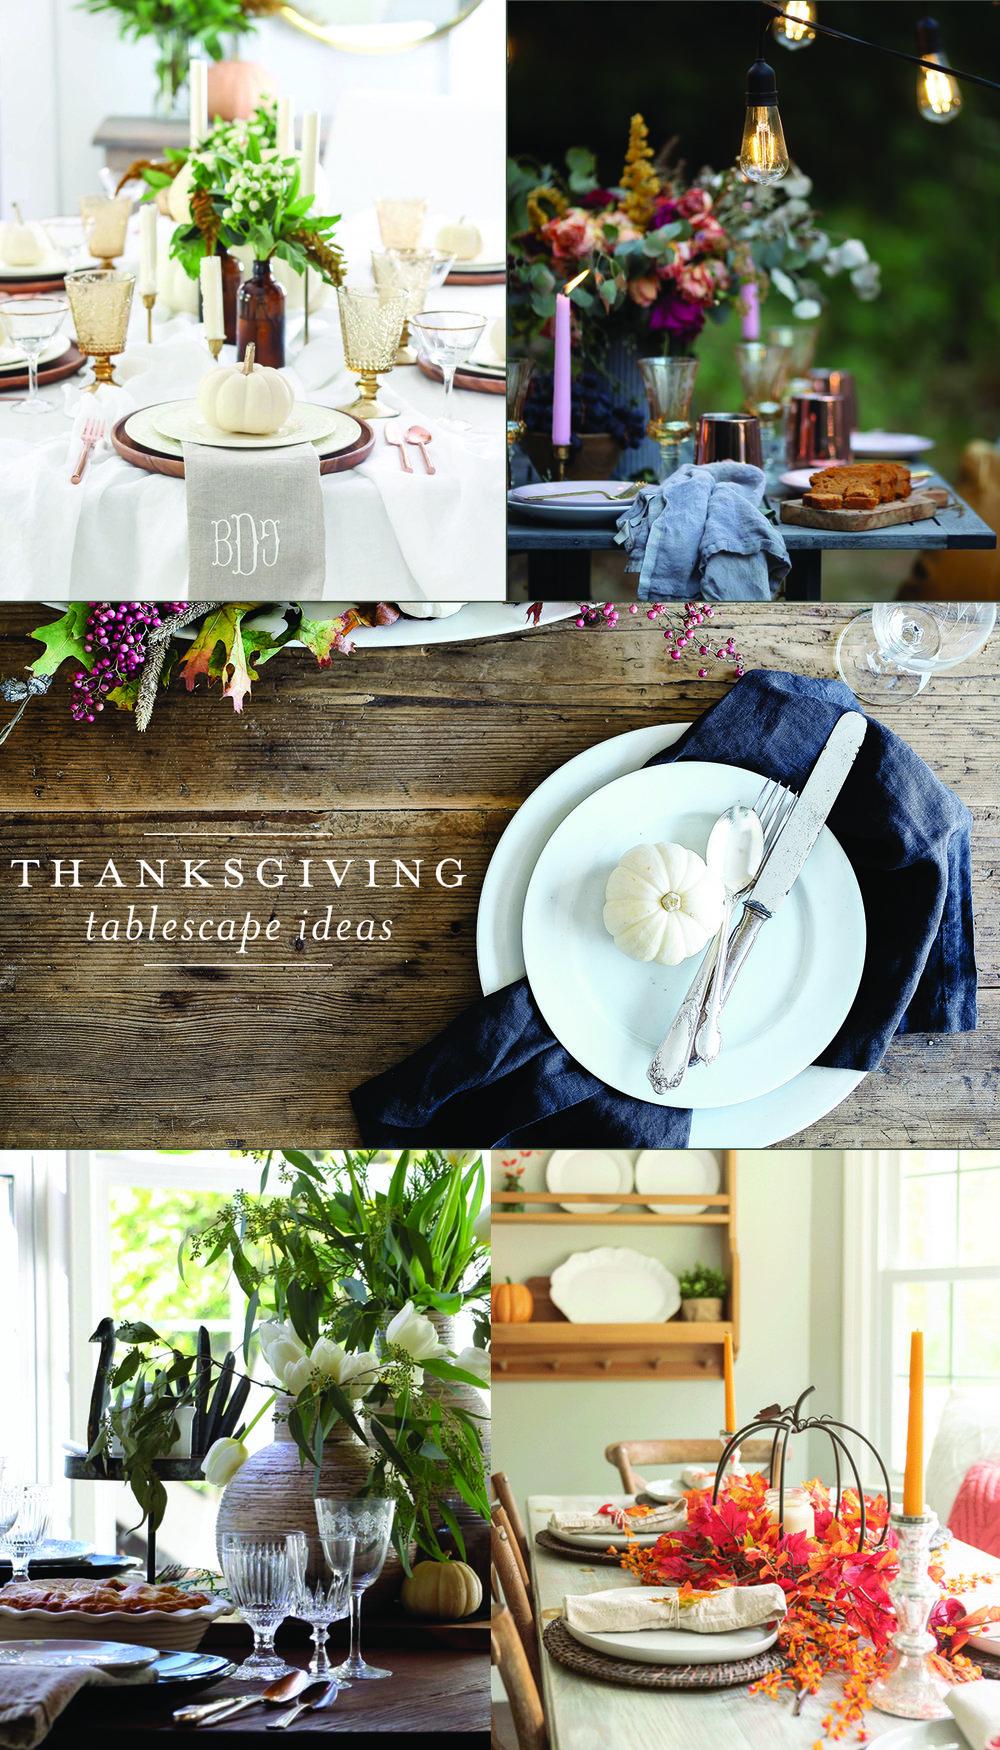 5 gorgeous Thanksgiving tablescape ideas! #thanksgivingdecor #thanksgivingtablescape